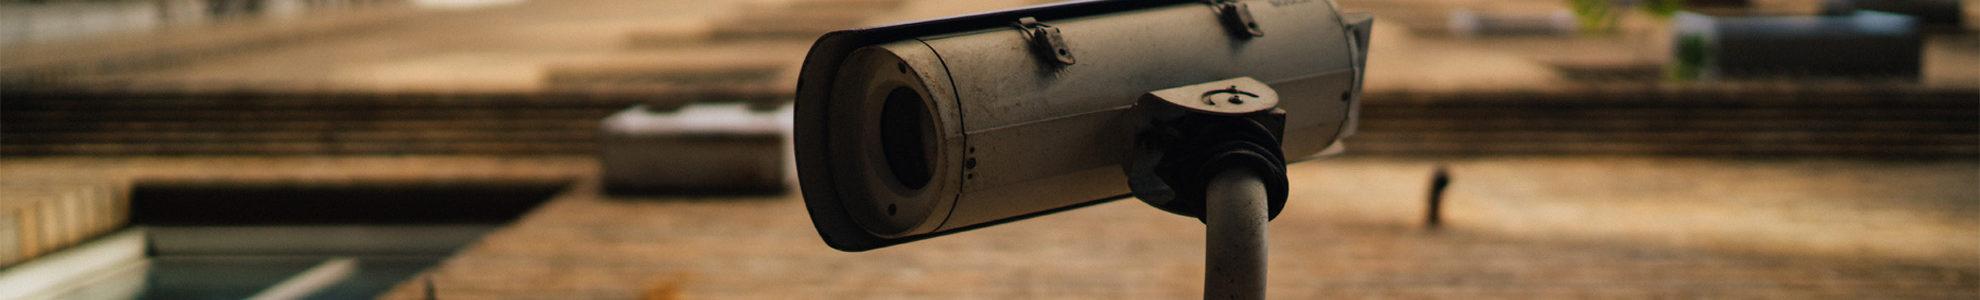 Wireless camera CCTV - CAMSAT 3